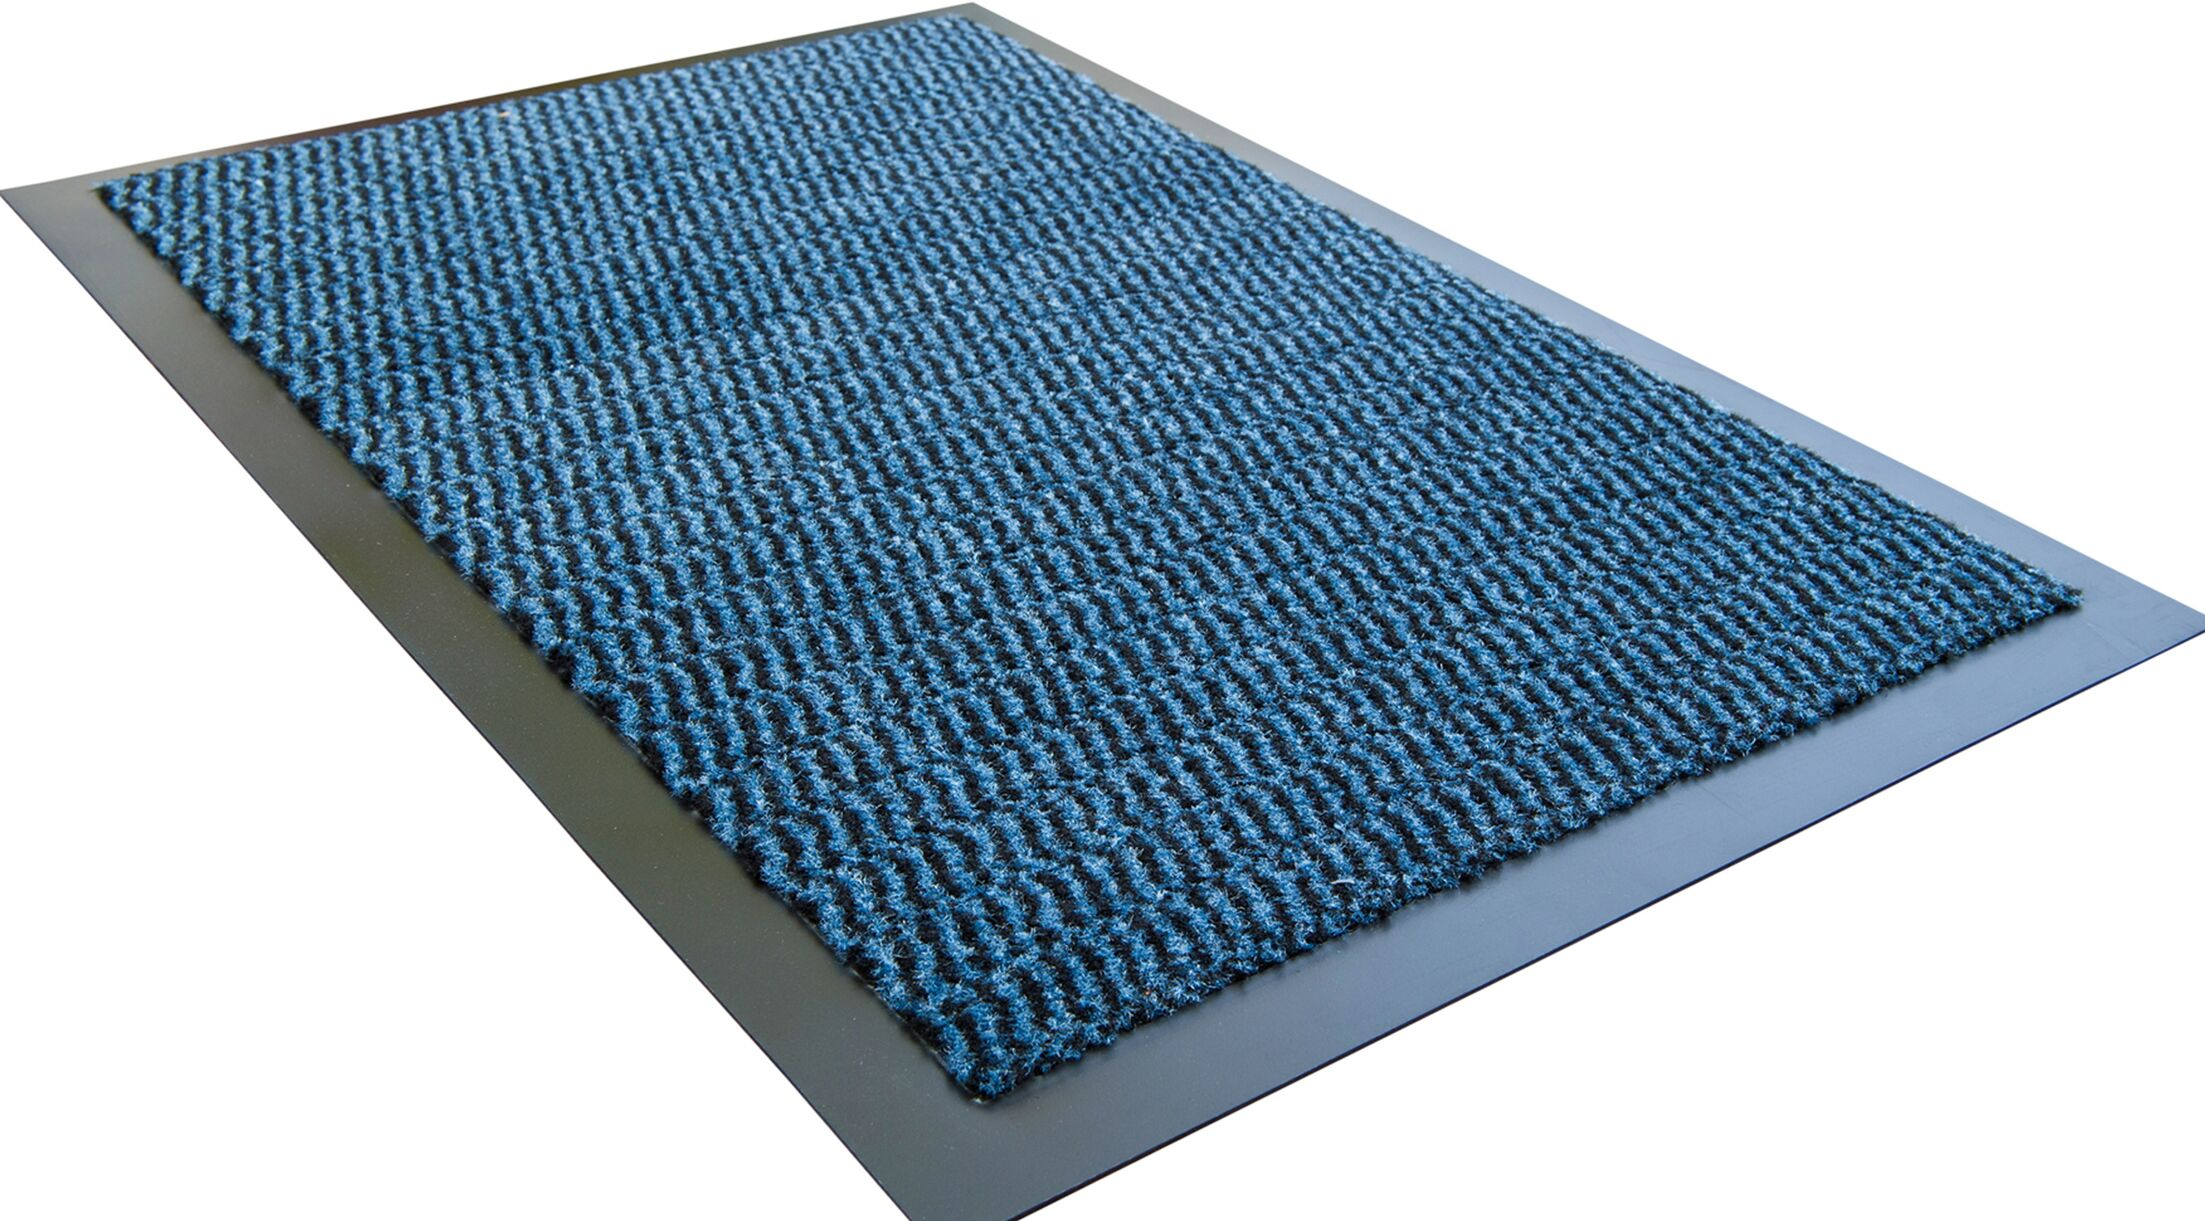 Hastings Advantage Doormat Color: Blue, Mat Size: 2' 8